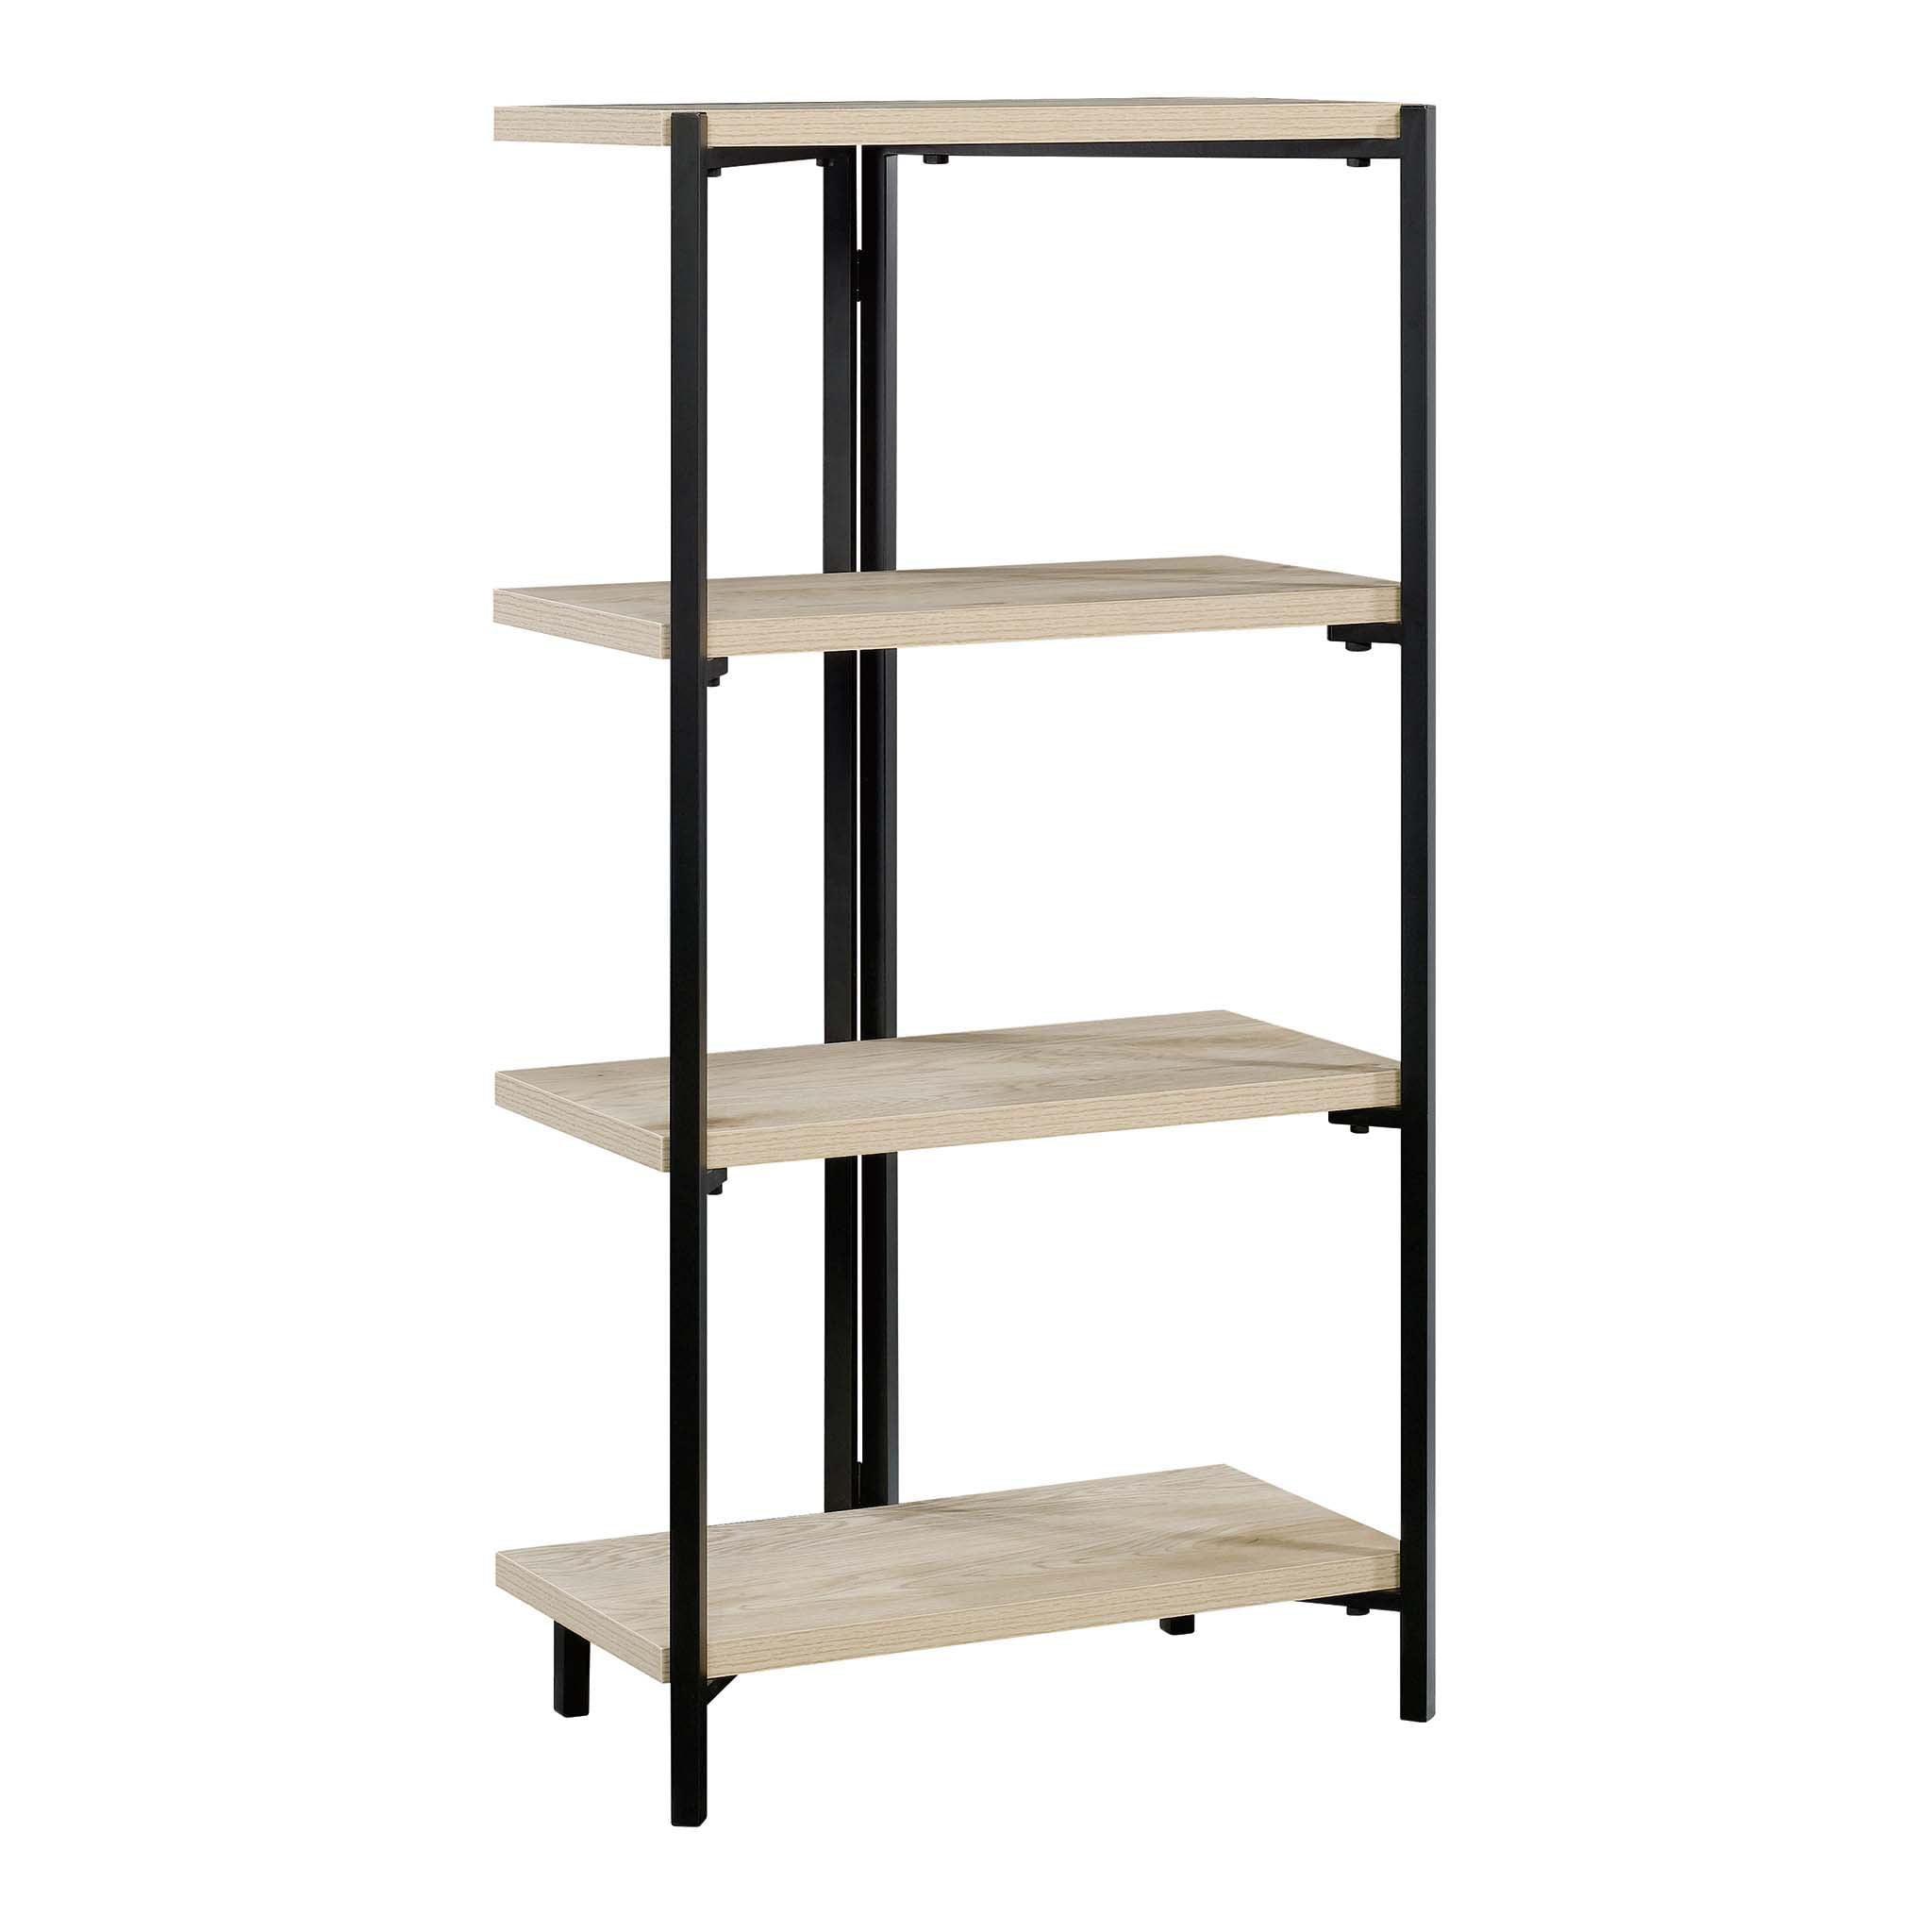 Mainstays No Tools 3 Shelf Bookcase, Natural Wood Finish